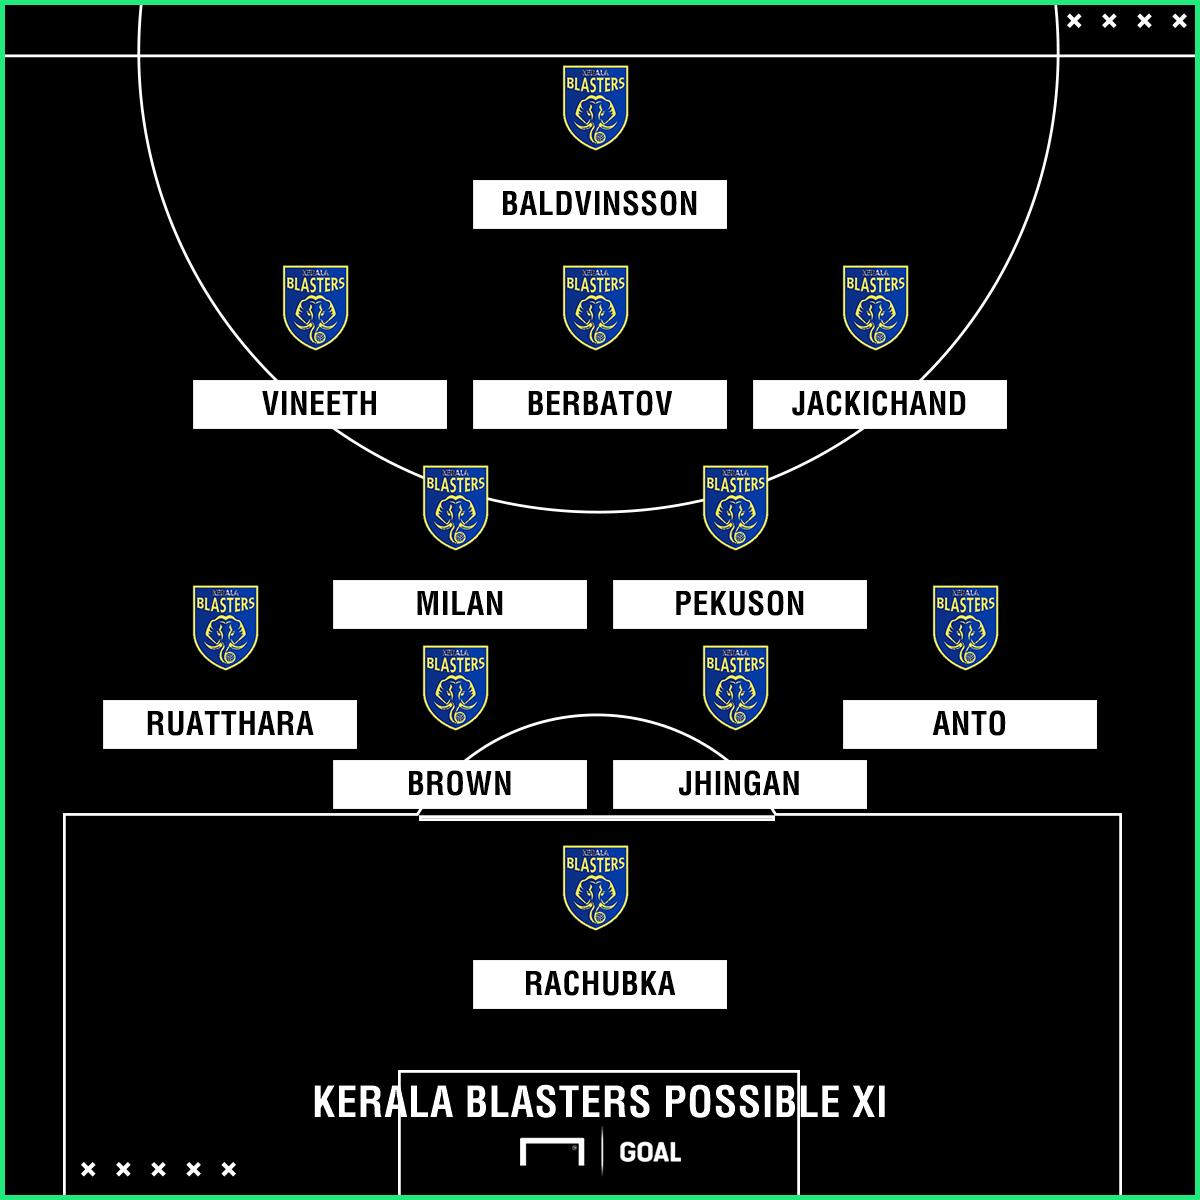 Kerala Blasters possible XI